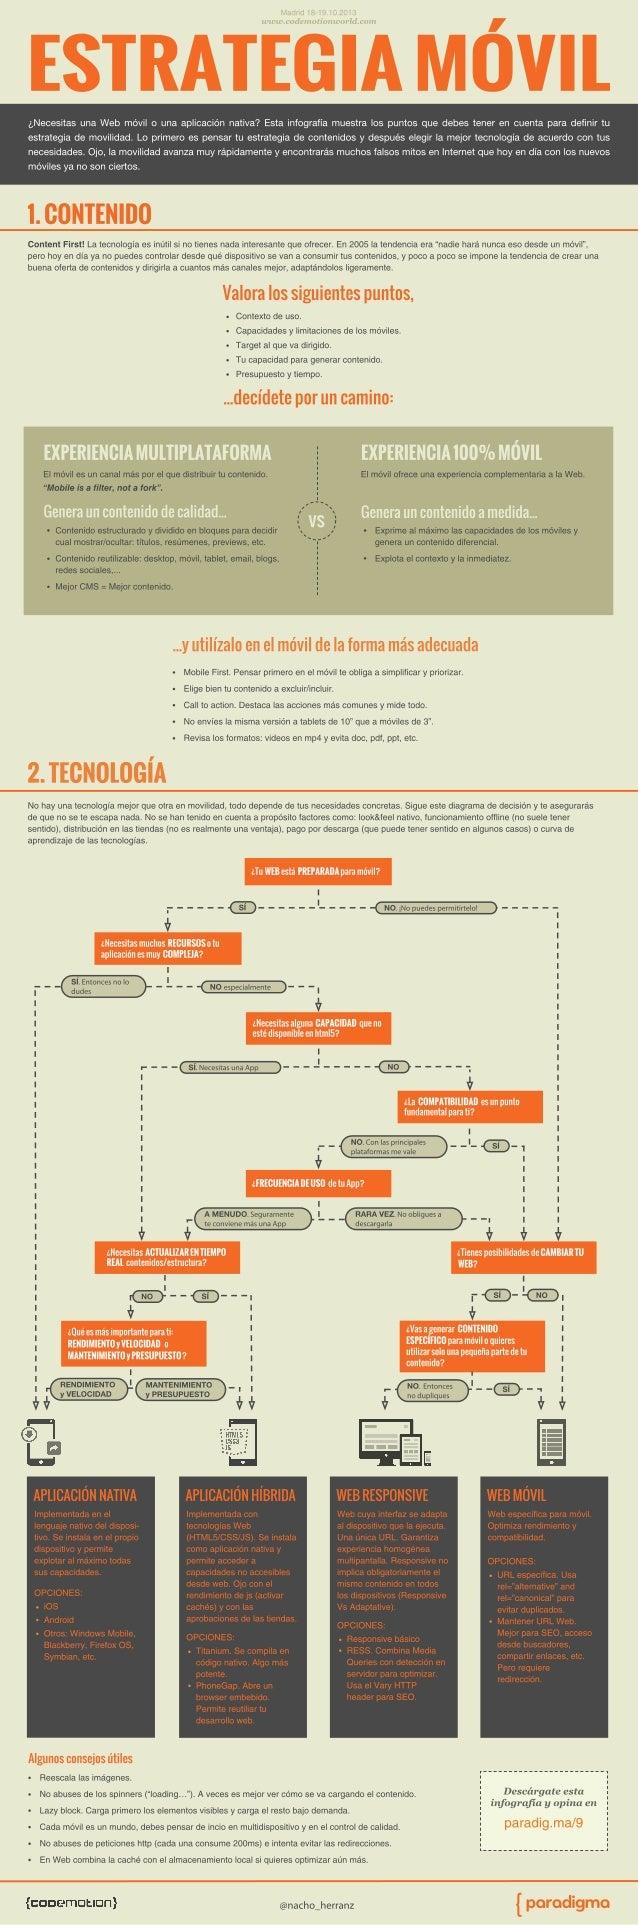 Estrategia móvil ¿Web o aplicación nativa?